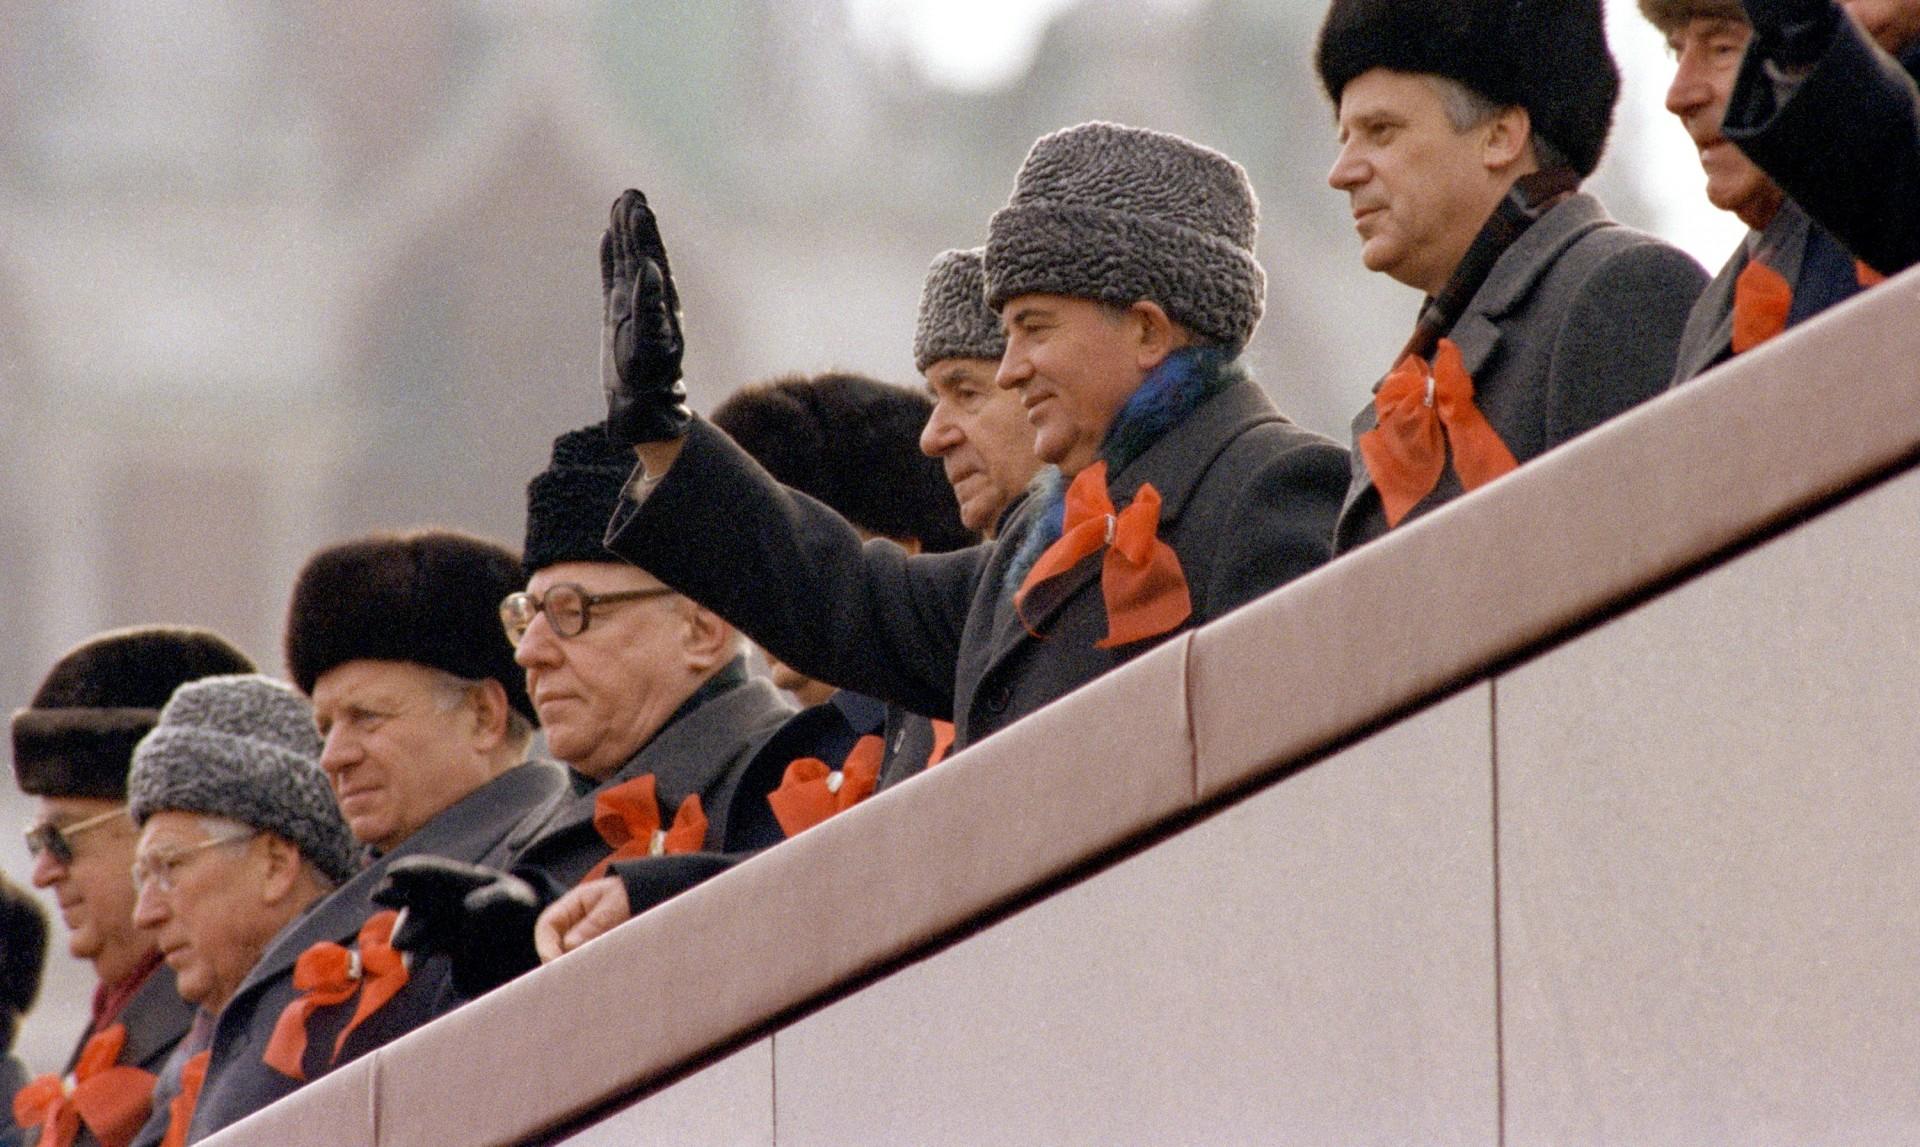 Mikhail Gorbachev and  Andrei Gromyko